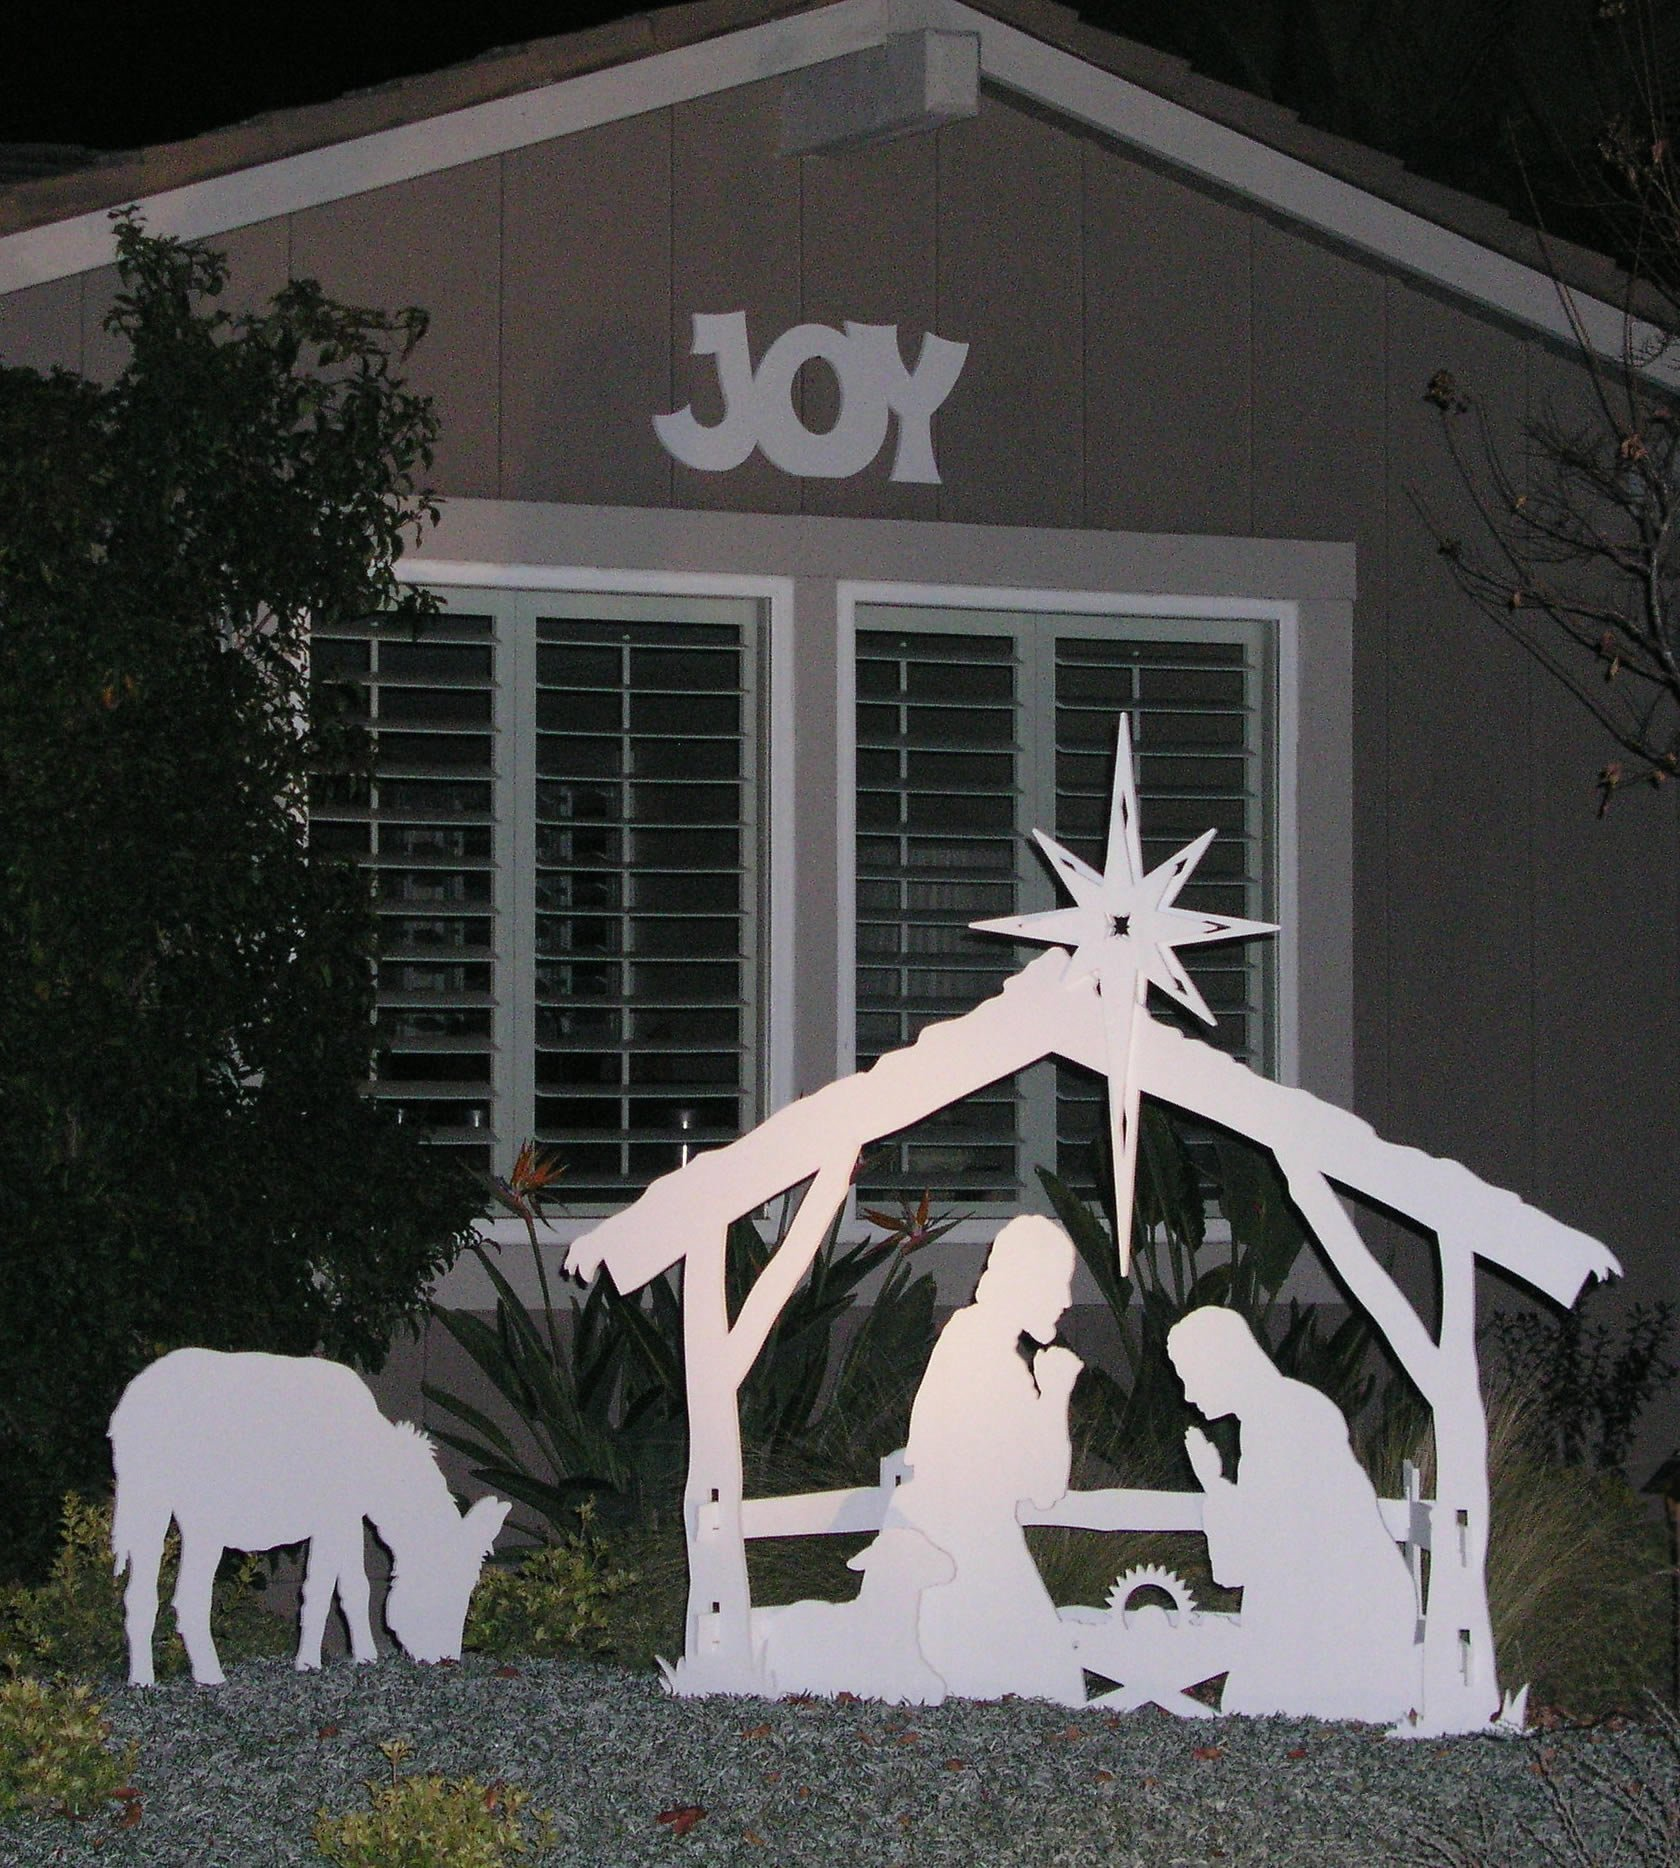 Medium Donkey for MyNativity Outdoor Nativity Set (3 sizes available)